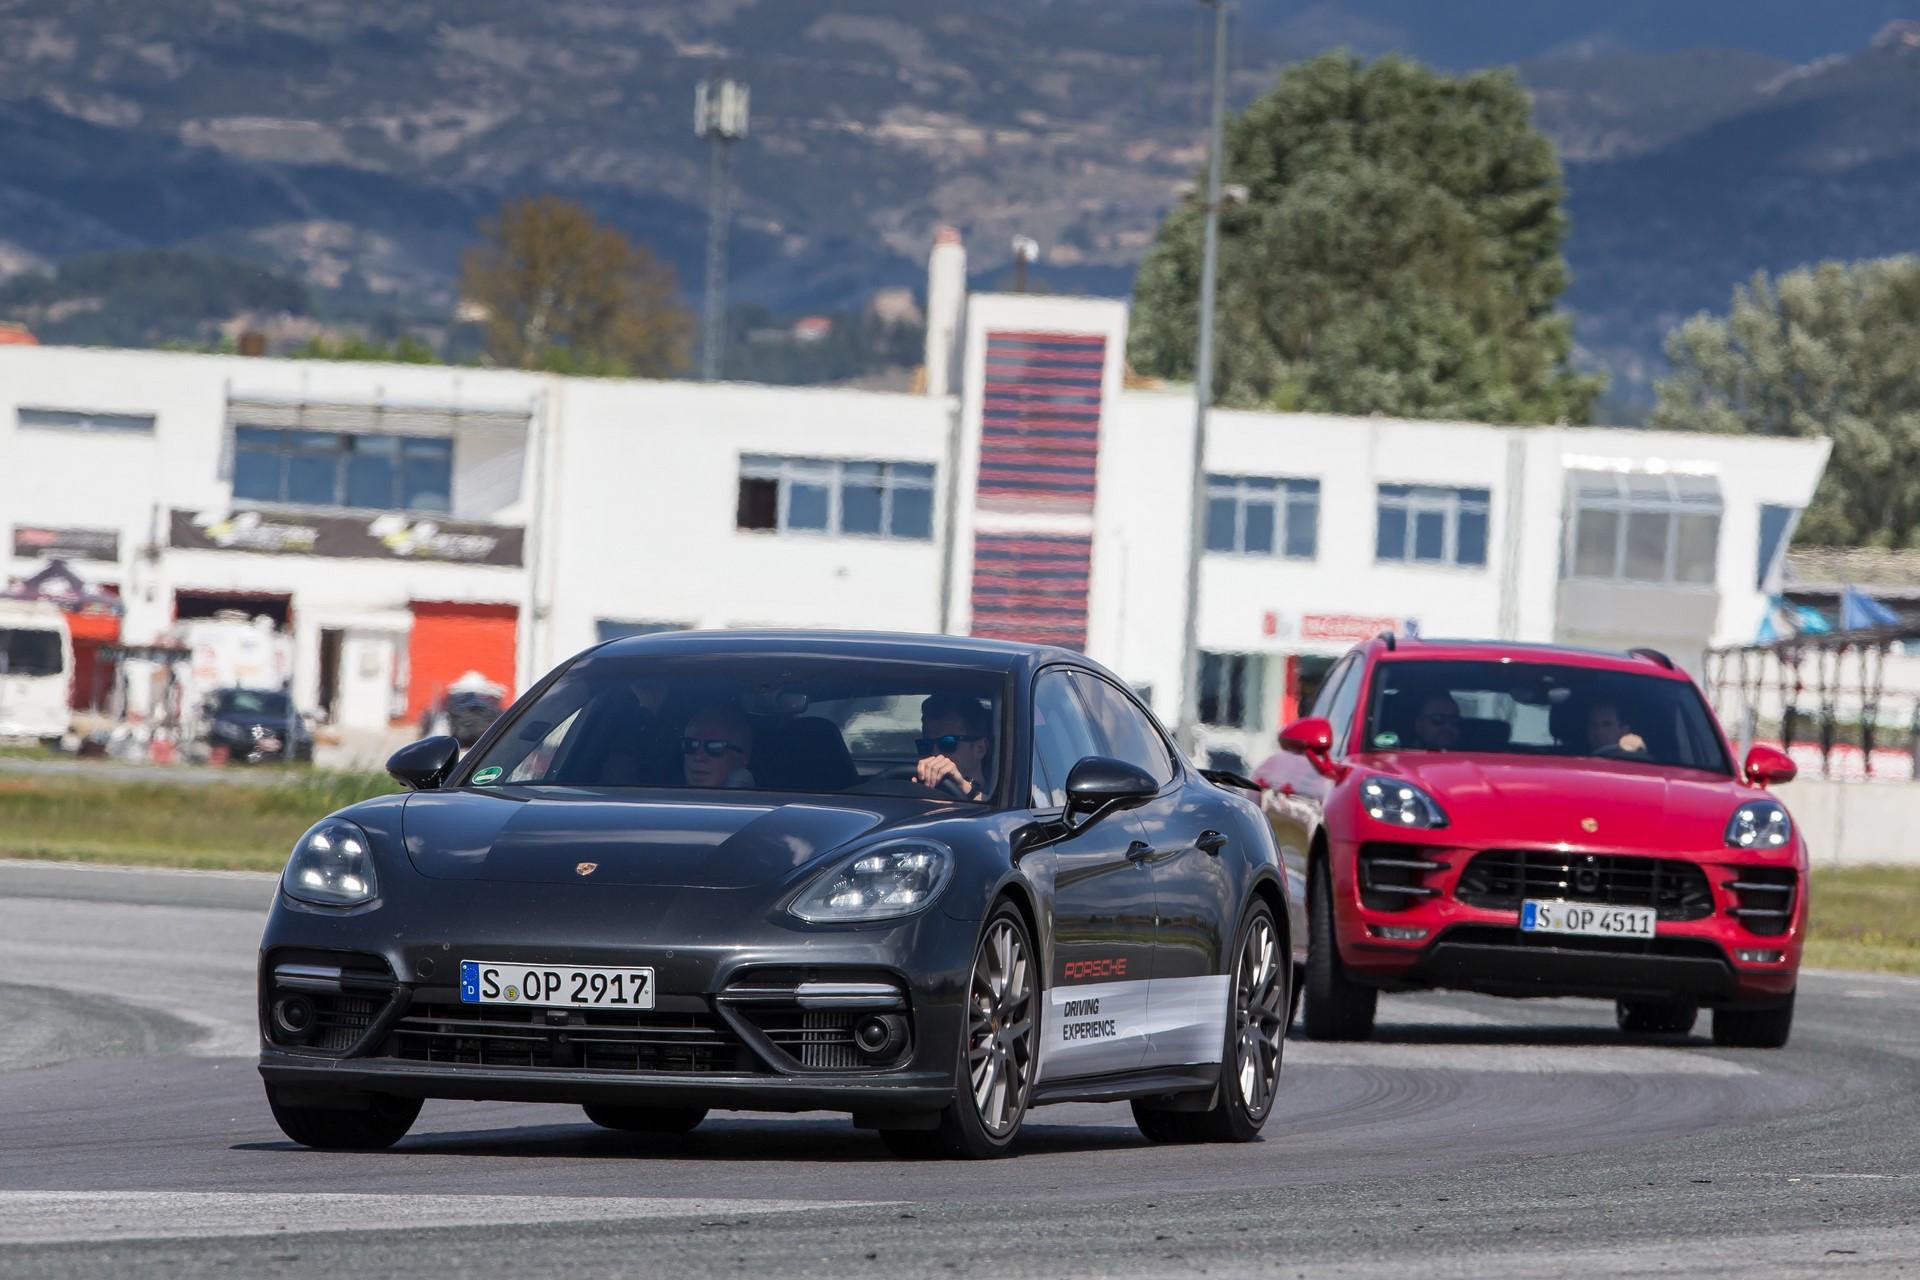 Porsche Driving Experience 2017 Serres (101)